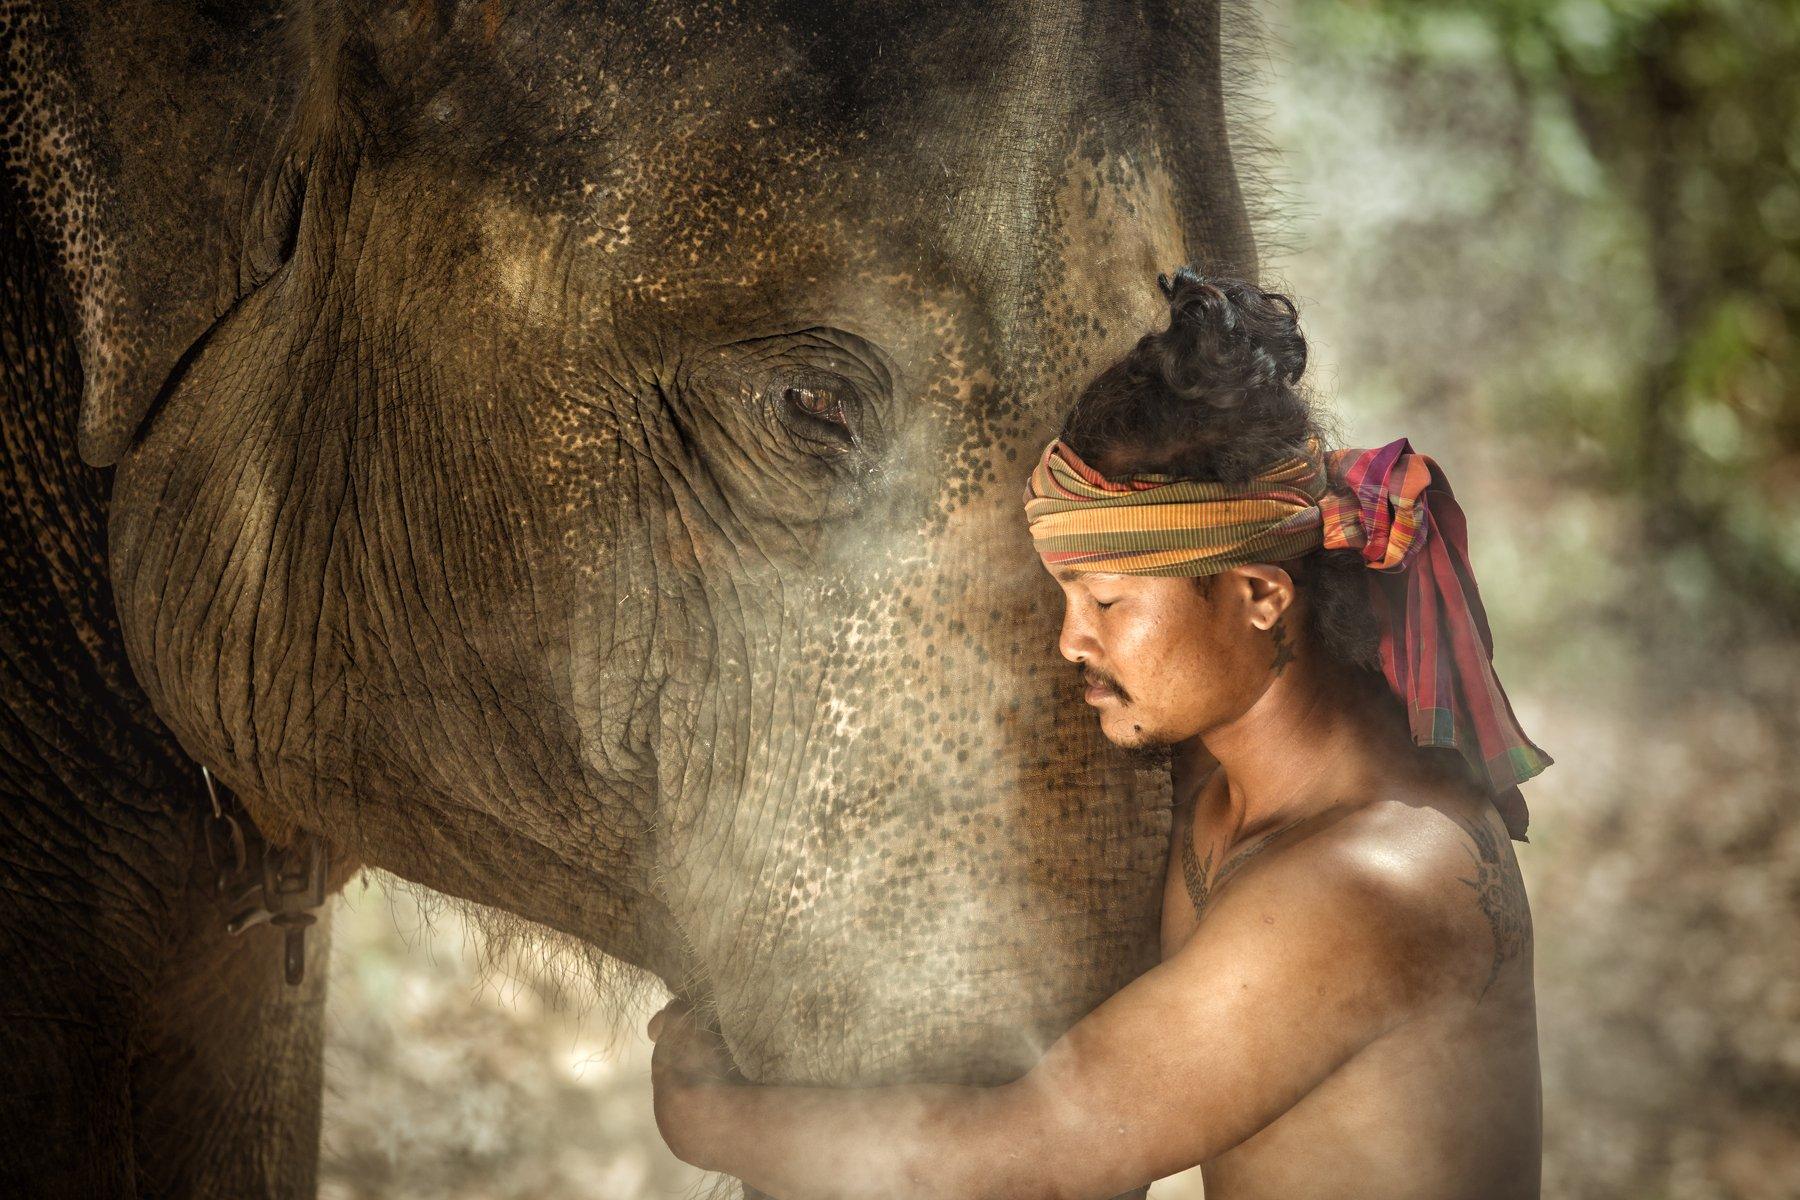 elephant,man,person,animal,thai,india,portrait,, SUTIPORN SOMNAM